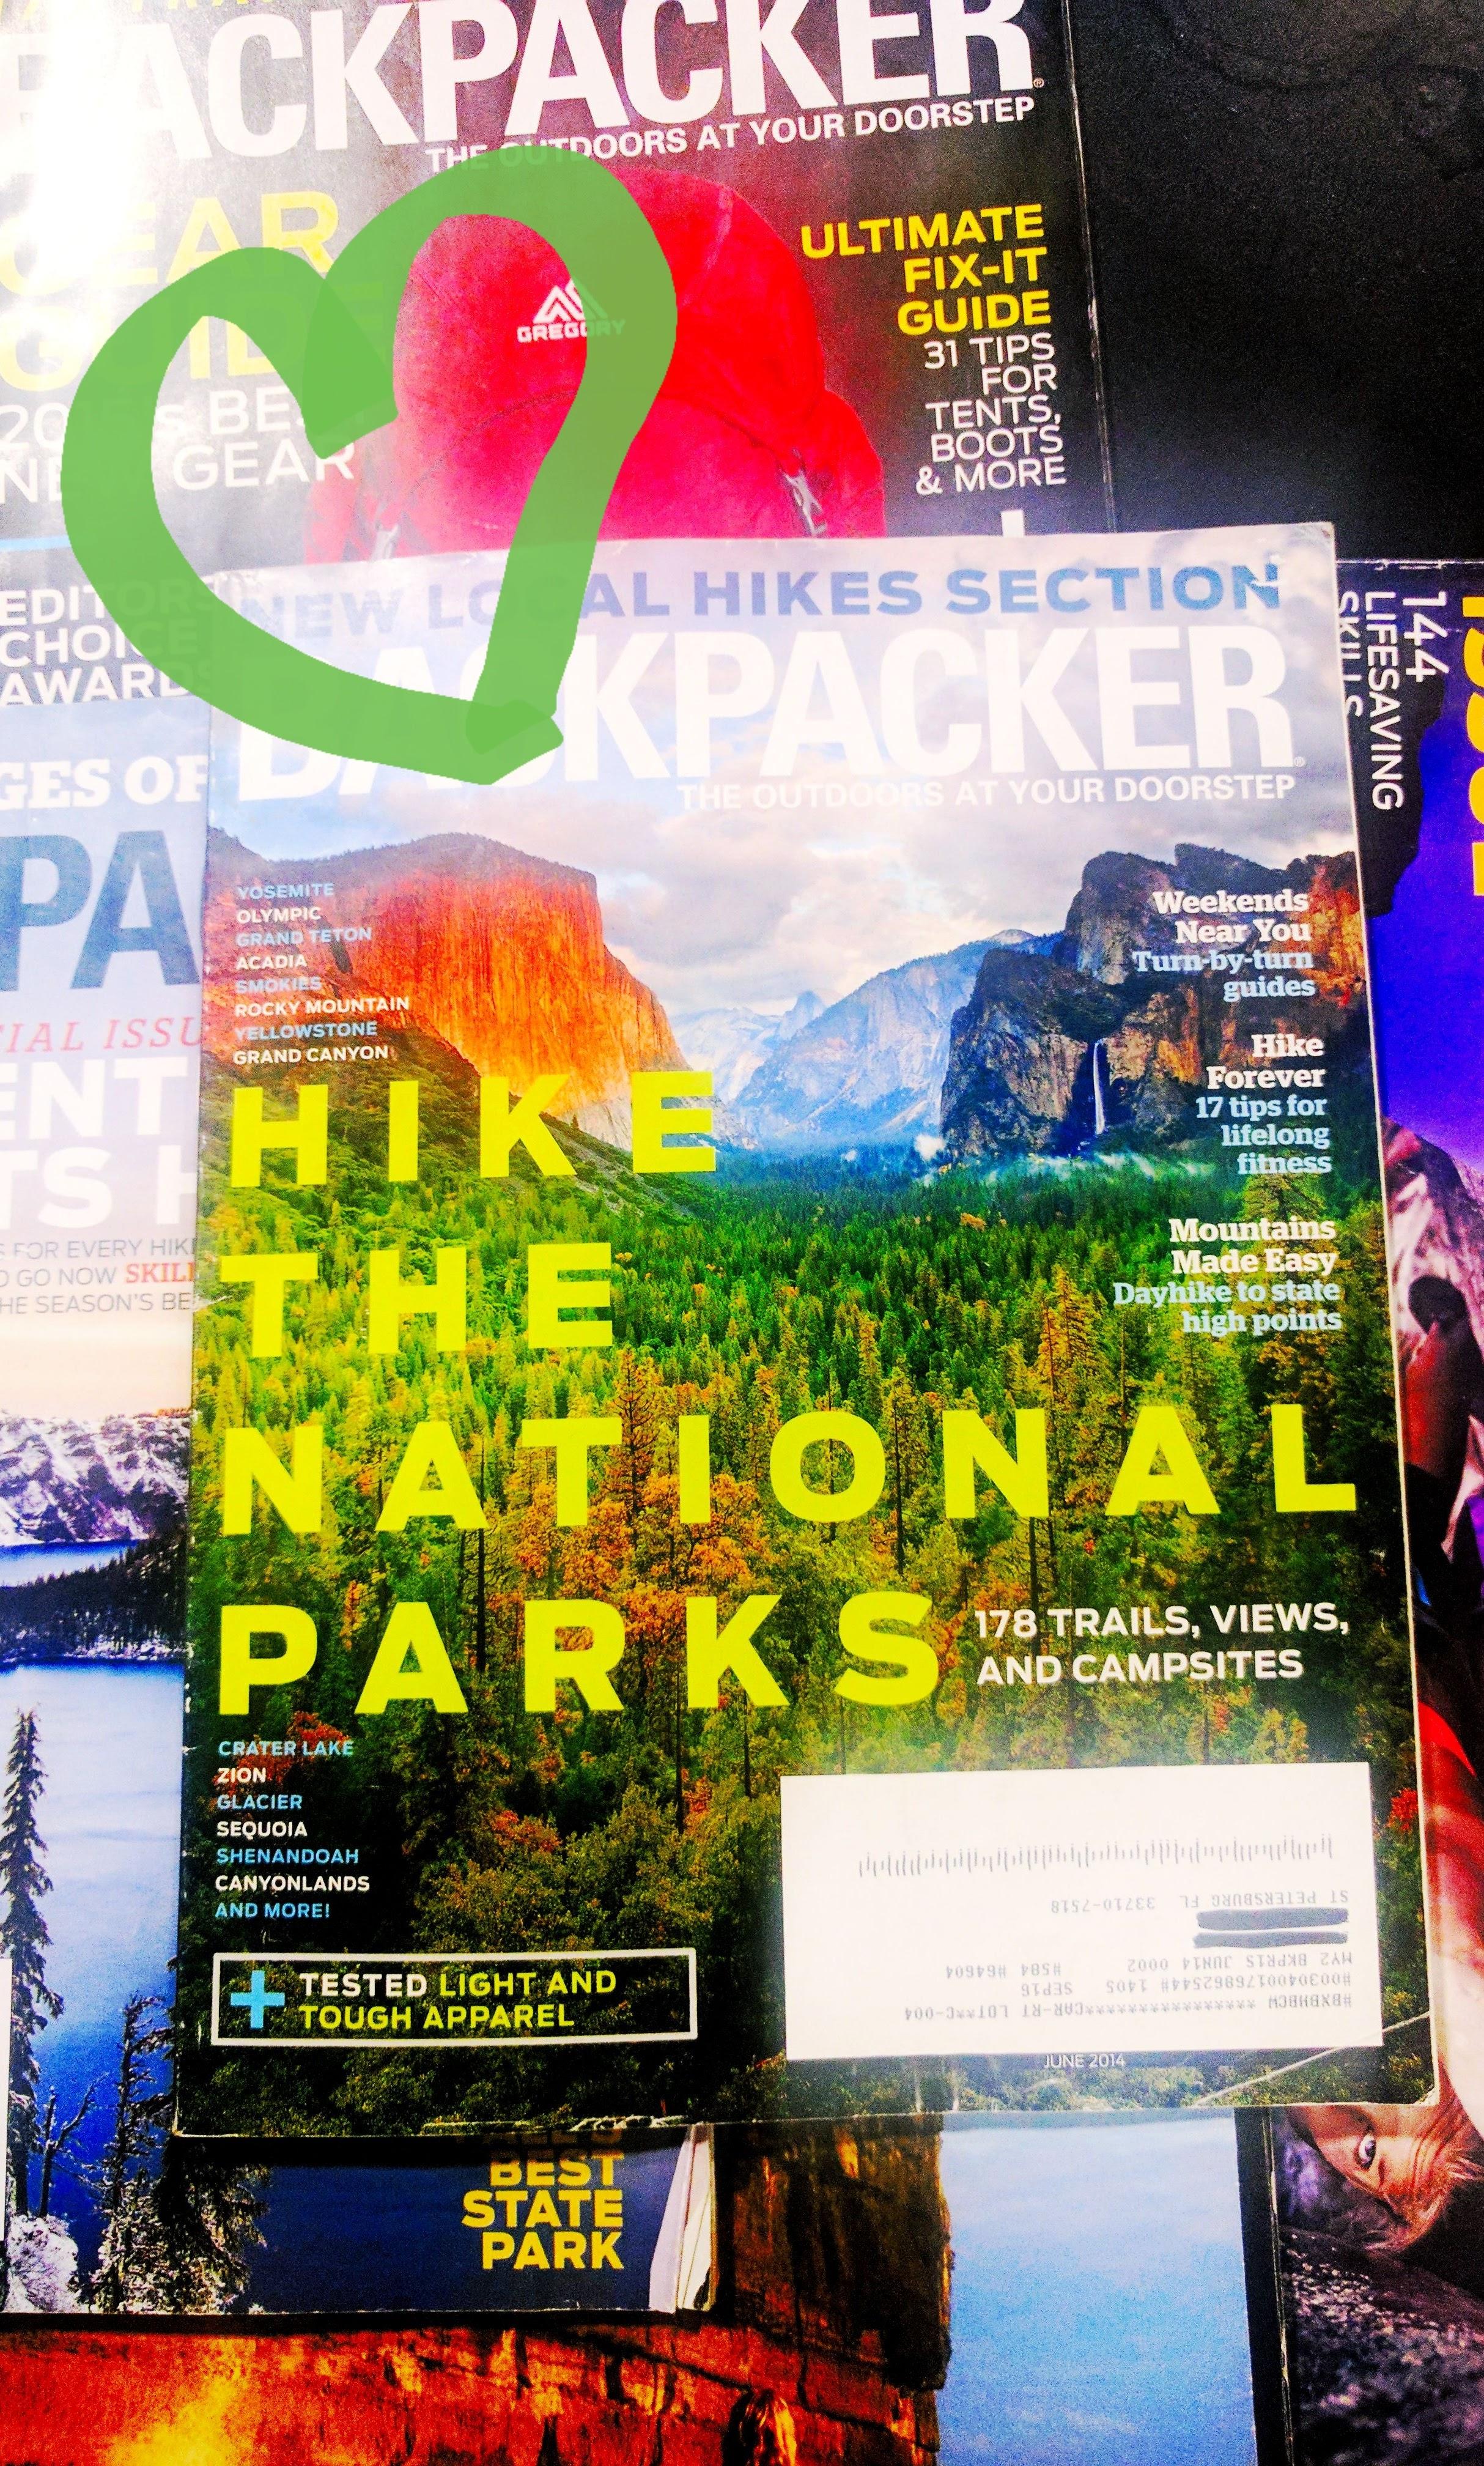 Magazines with National Parks make me Wanderlust Bigtime!